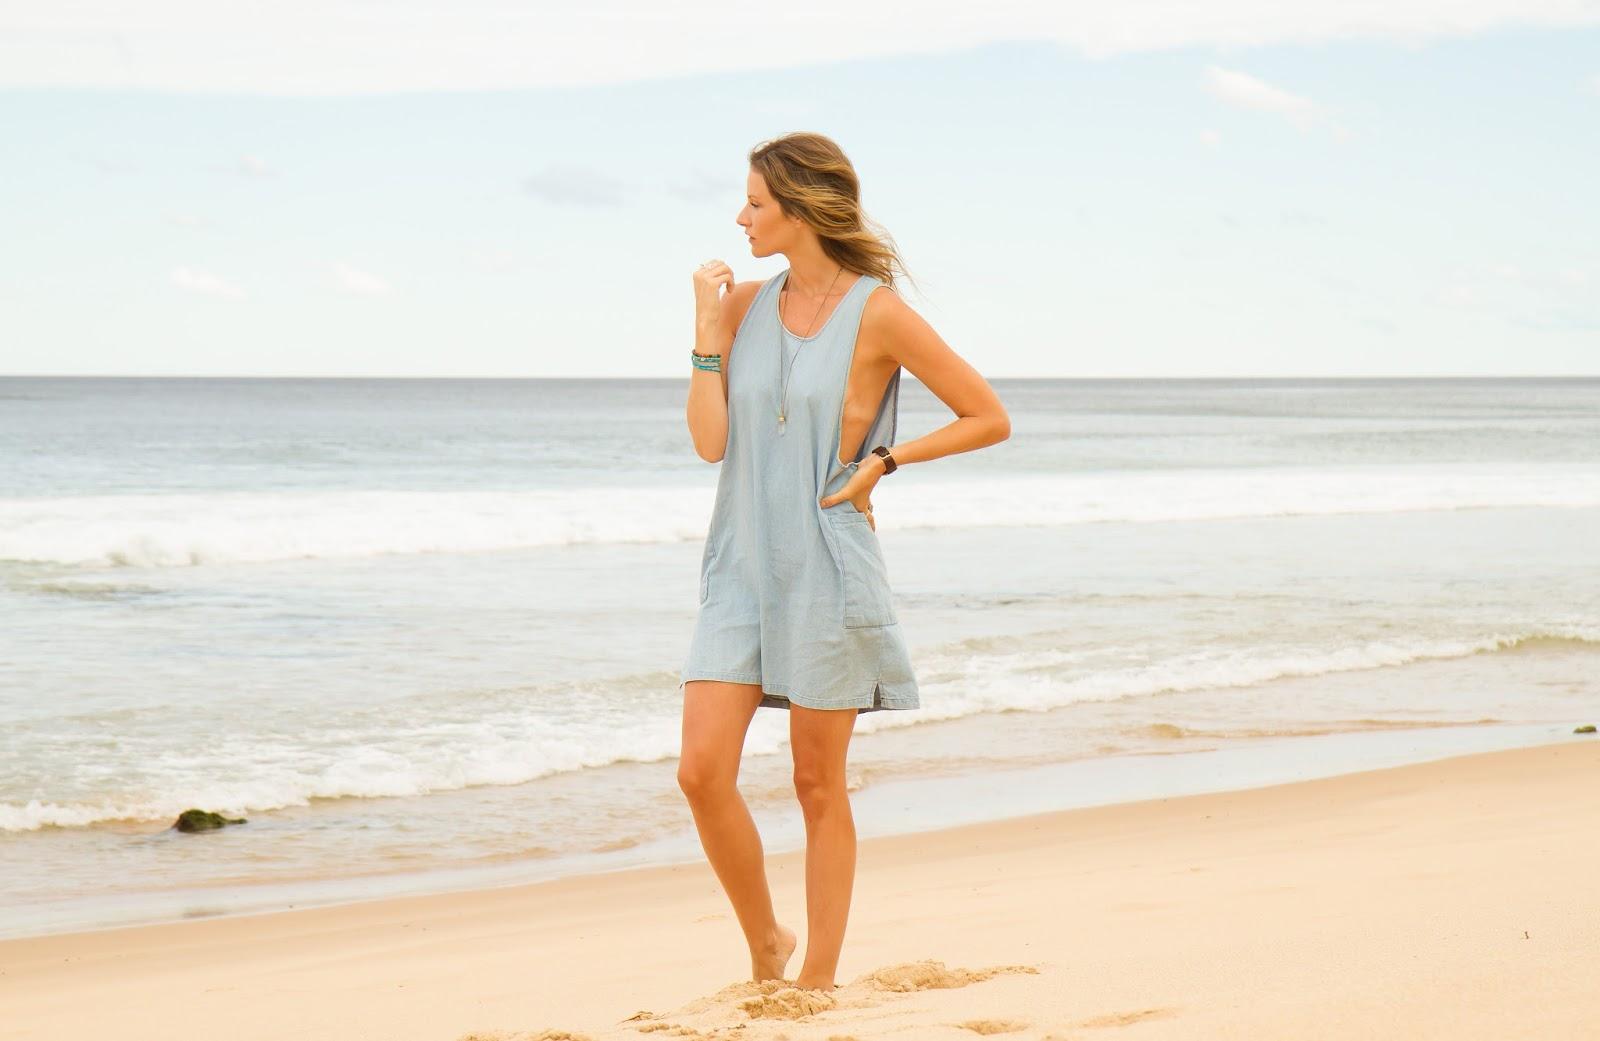 fashion blogger, alison hutchinson, at Garie Beach in Sydney, Australia